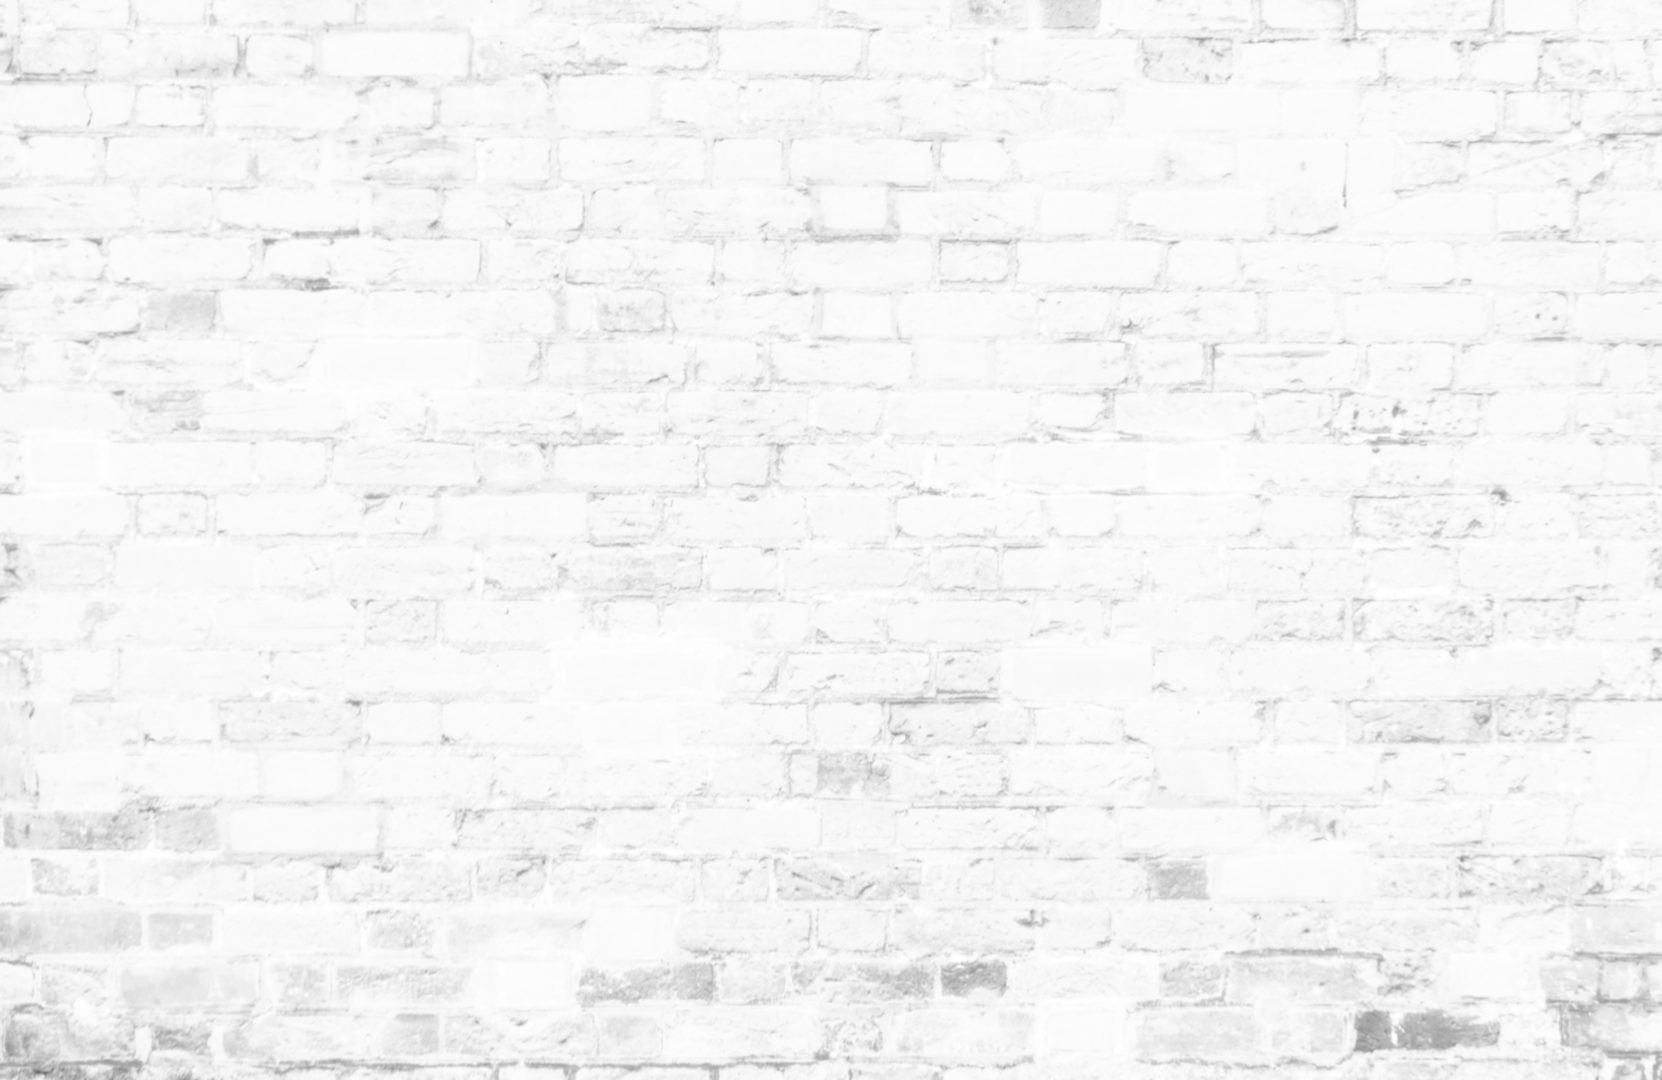 White Brick Wall - Background